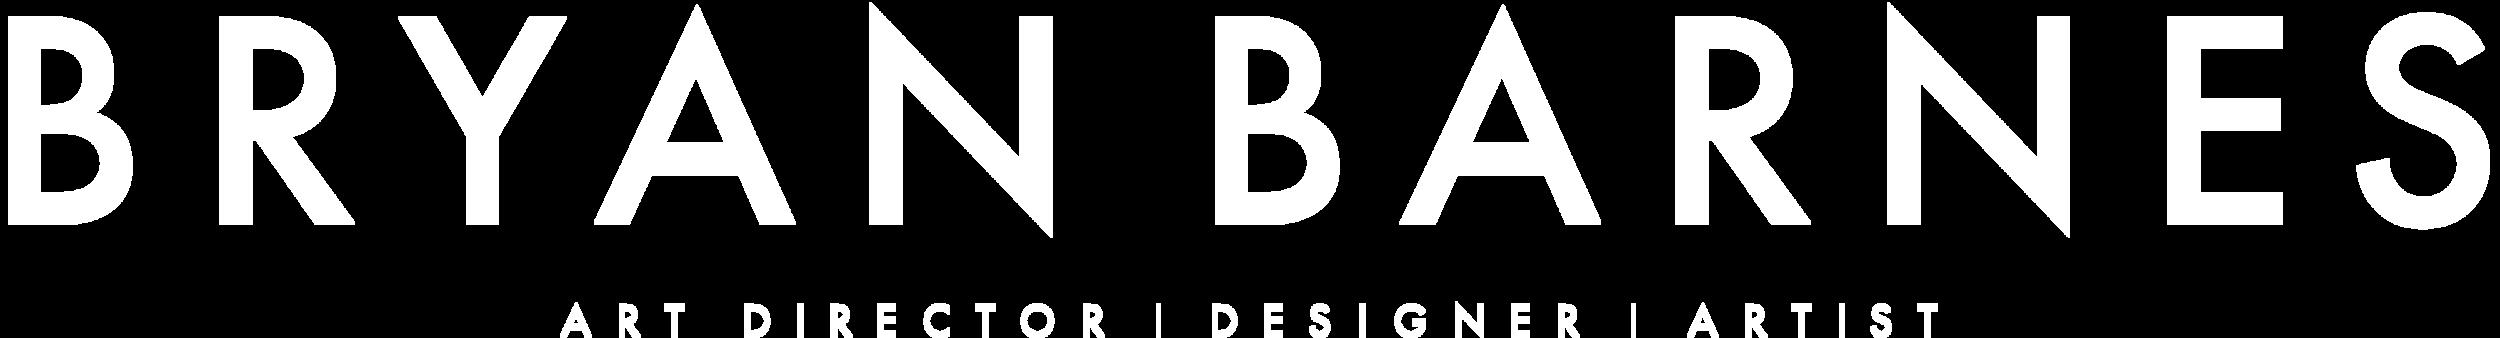 BBKUNST_BRYAN_BARNES_ART_DIRECTOR_DESIGNER_ARTIST_LOGO.png